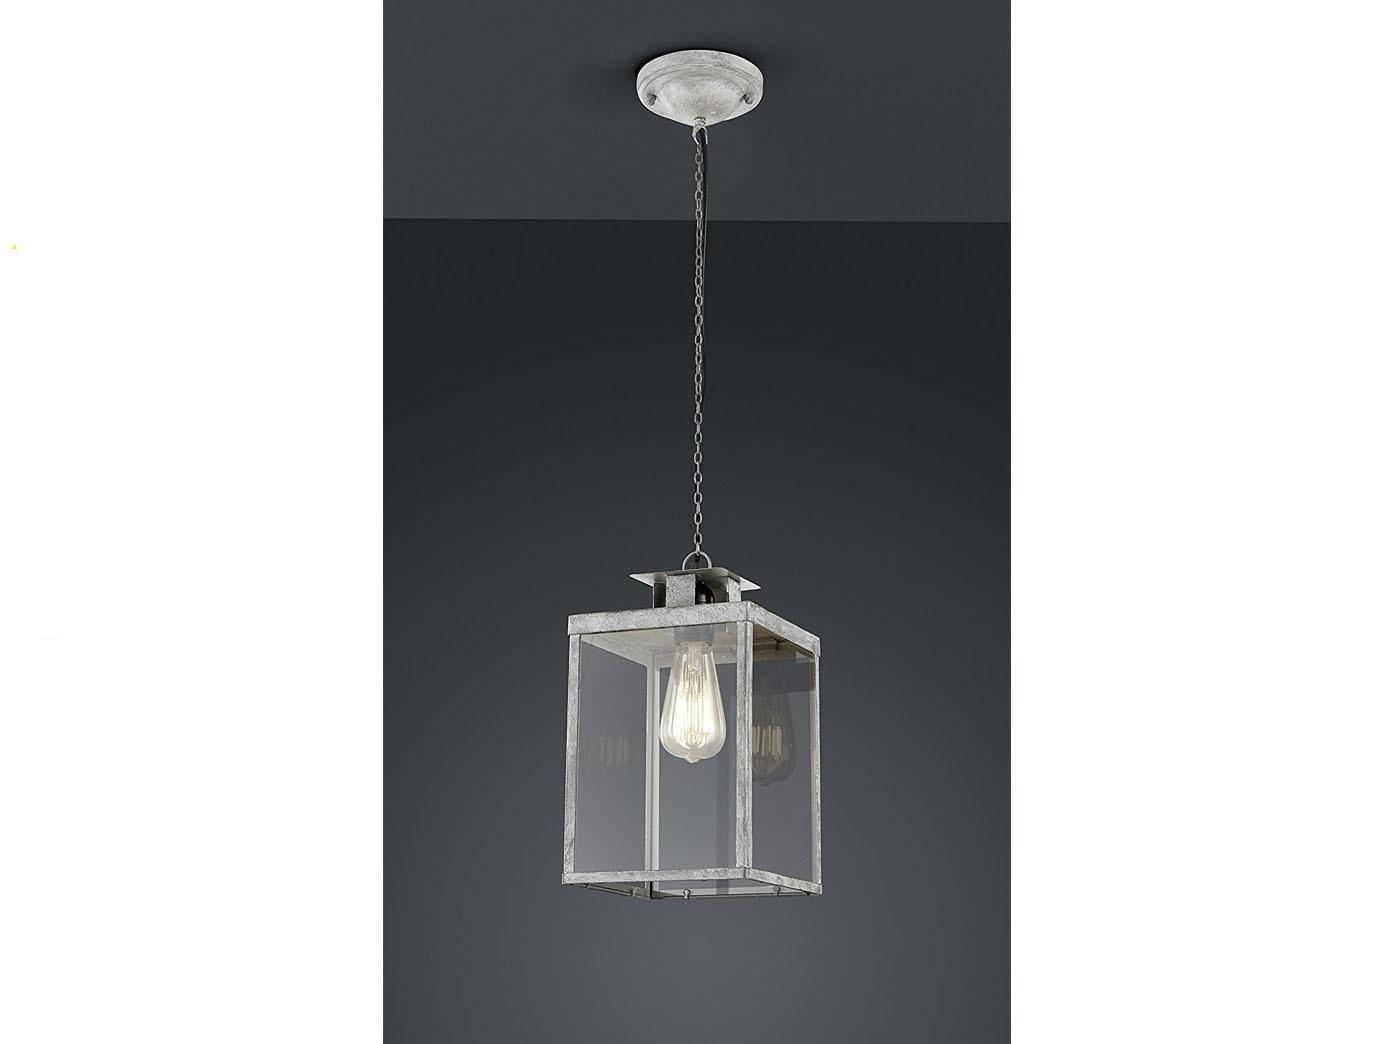 Retro Pendelleuchte eckig Design grau antik, Glas klar, Hängelampe ...